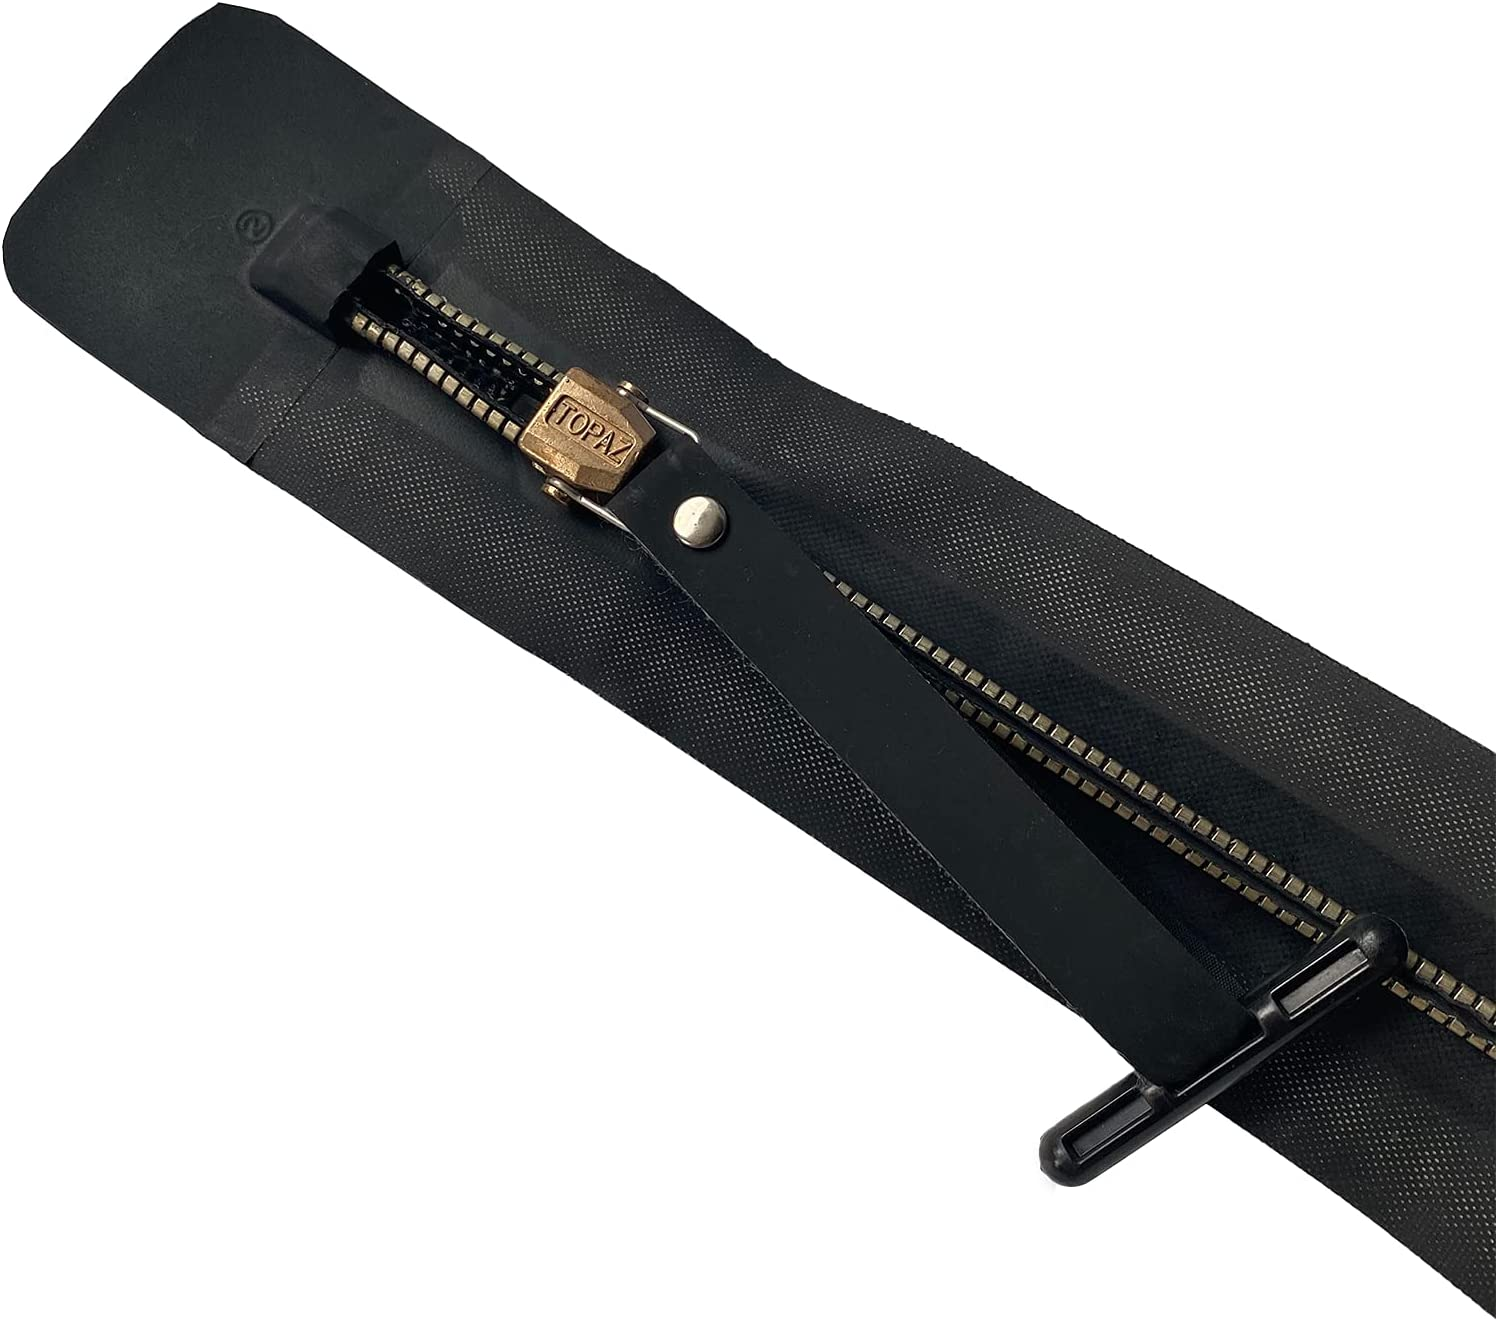 8# Diving Drysuit Zipper Neoprene Tape and Metal Teeth Heavy Dut